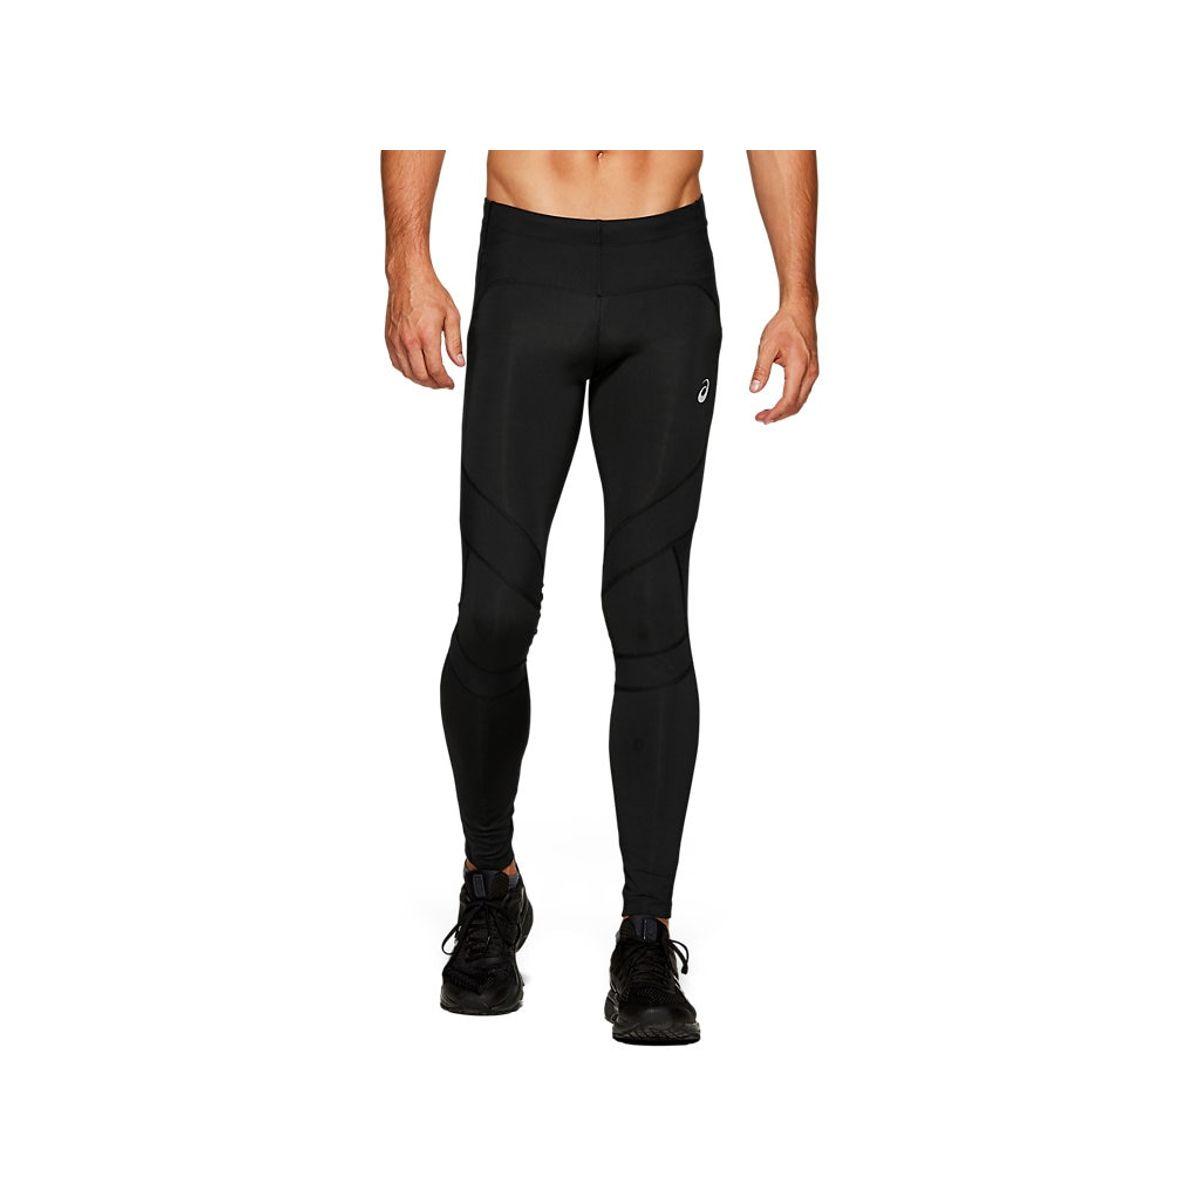 Calca-Legging-Asics-de-Compressao-Leg-Balance-Tight-2---Masculino---Preto